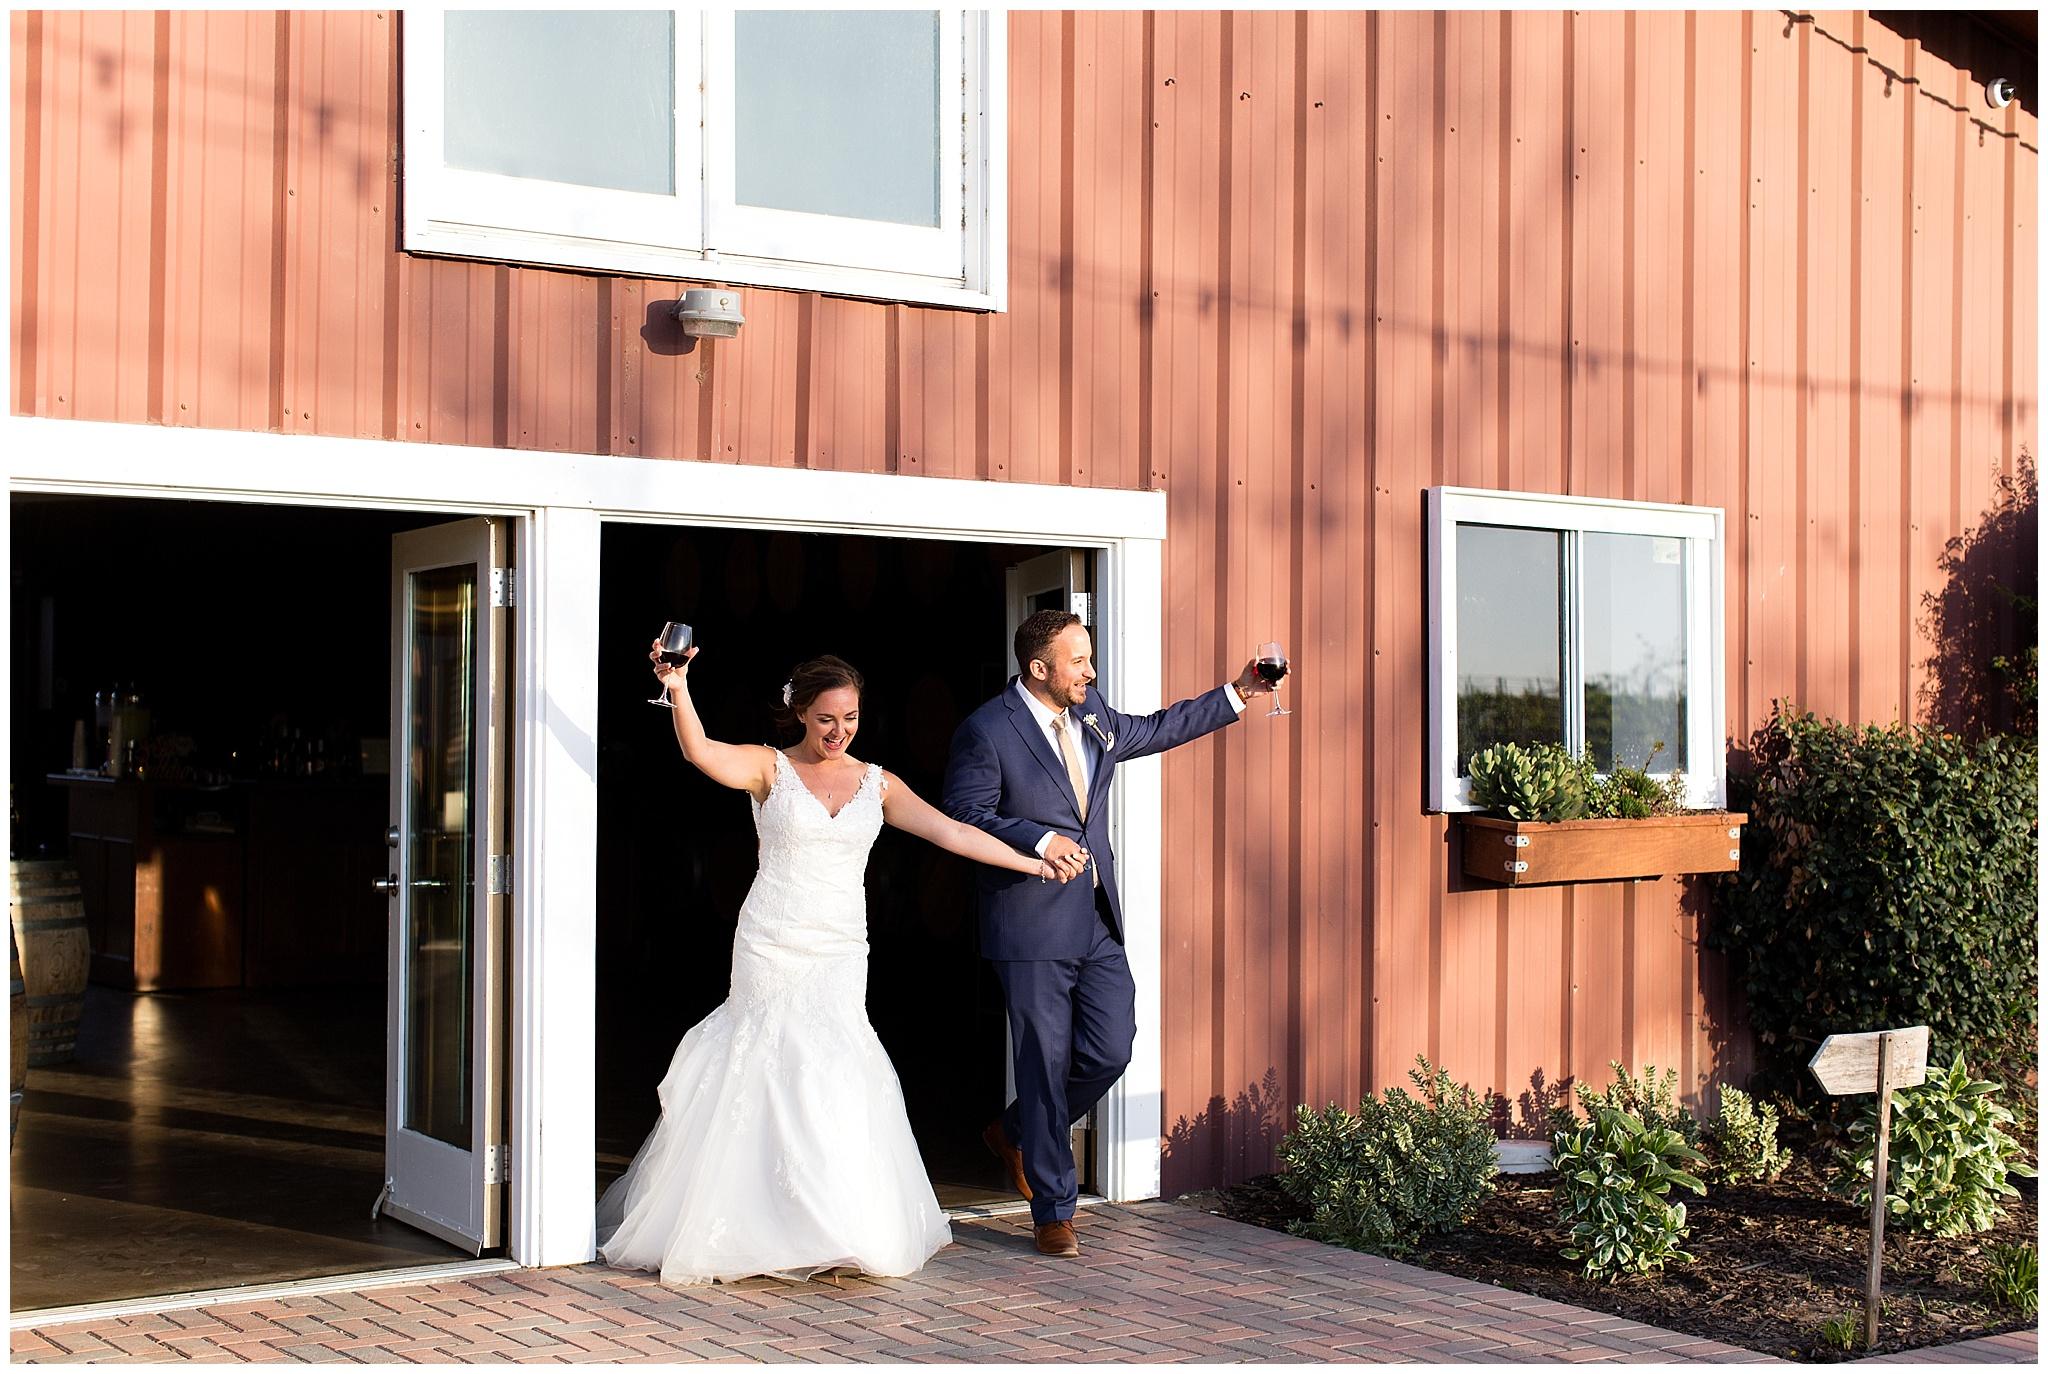 Vinny-Cayt-Wedding-04-26-18-1667.jpg